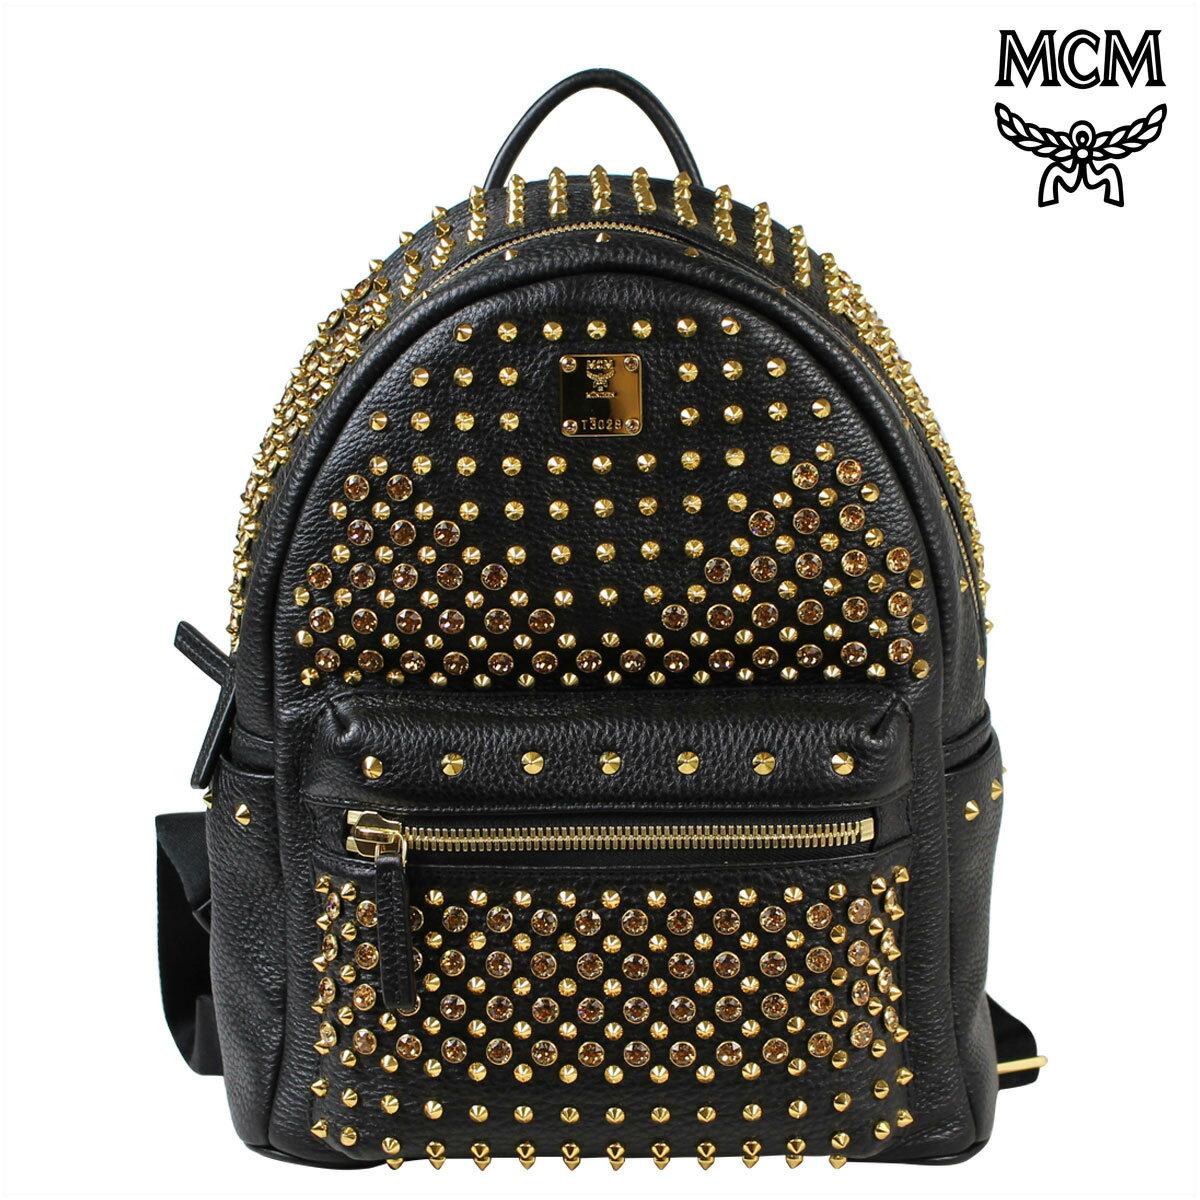 MCM エムシーエム バッグ リュック バックパック MMK 5SVE73 BK001 ブラック レディース